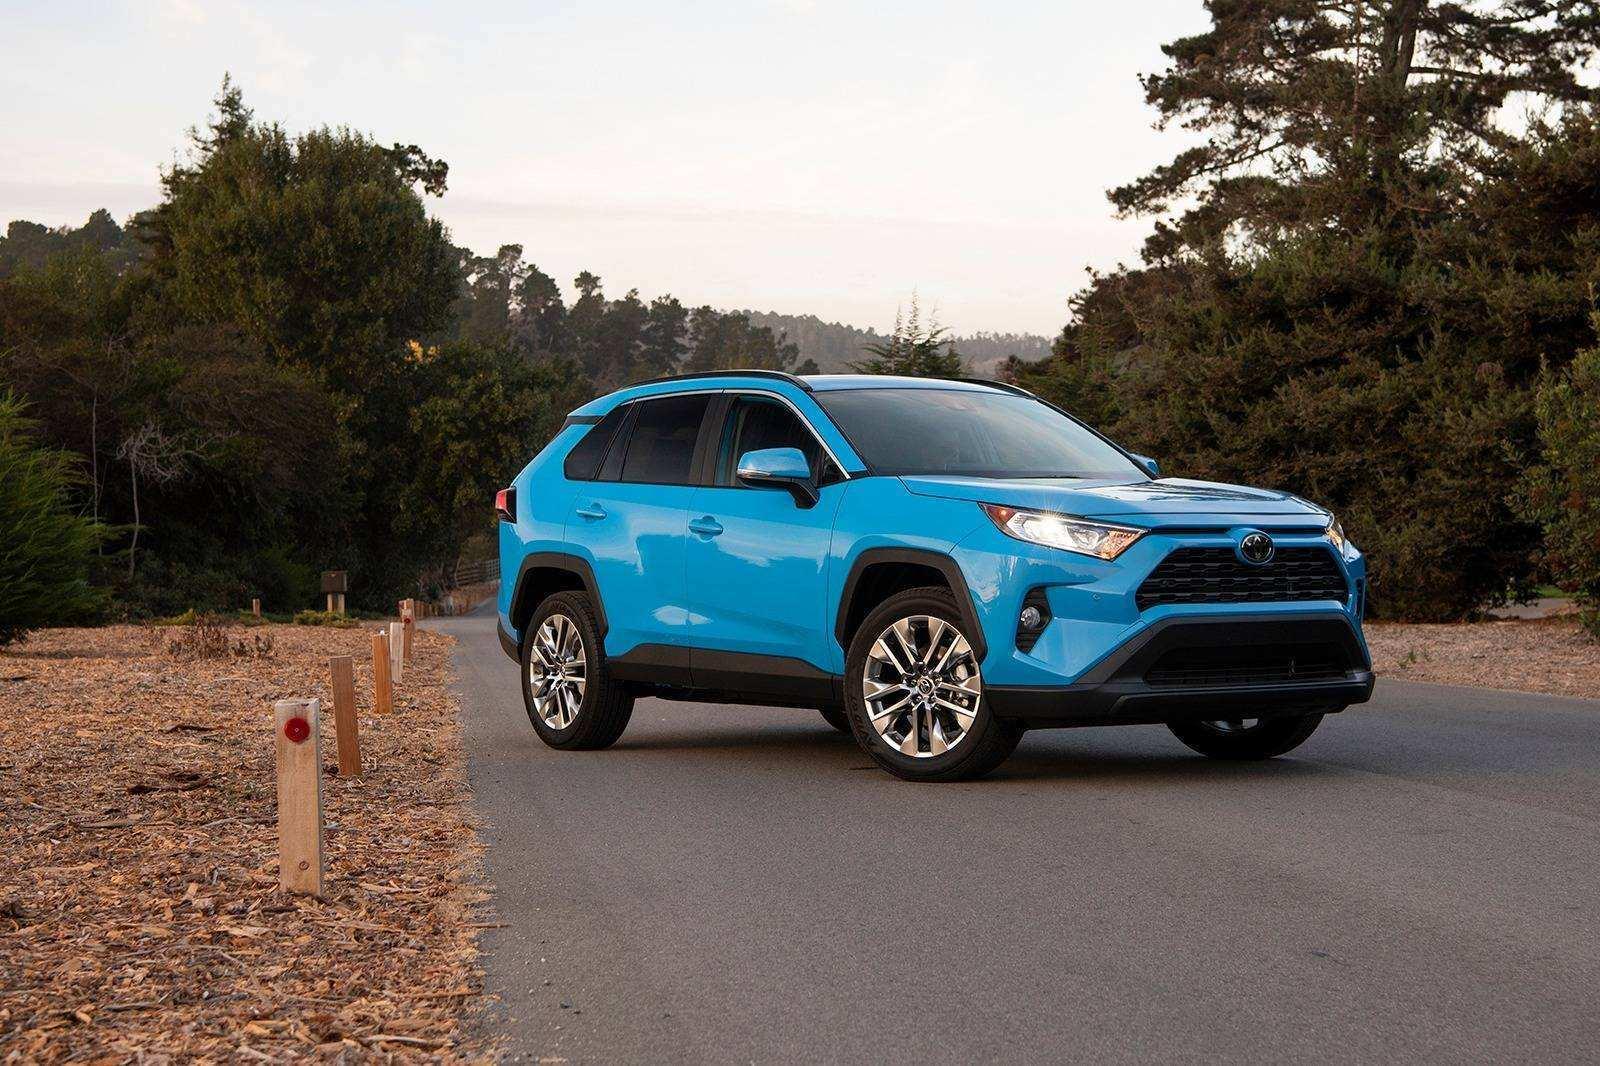 16 Gallery of Toyota 2019 Crv Price Price with Toyota 2019 Crv Price